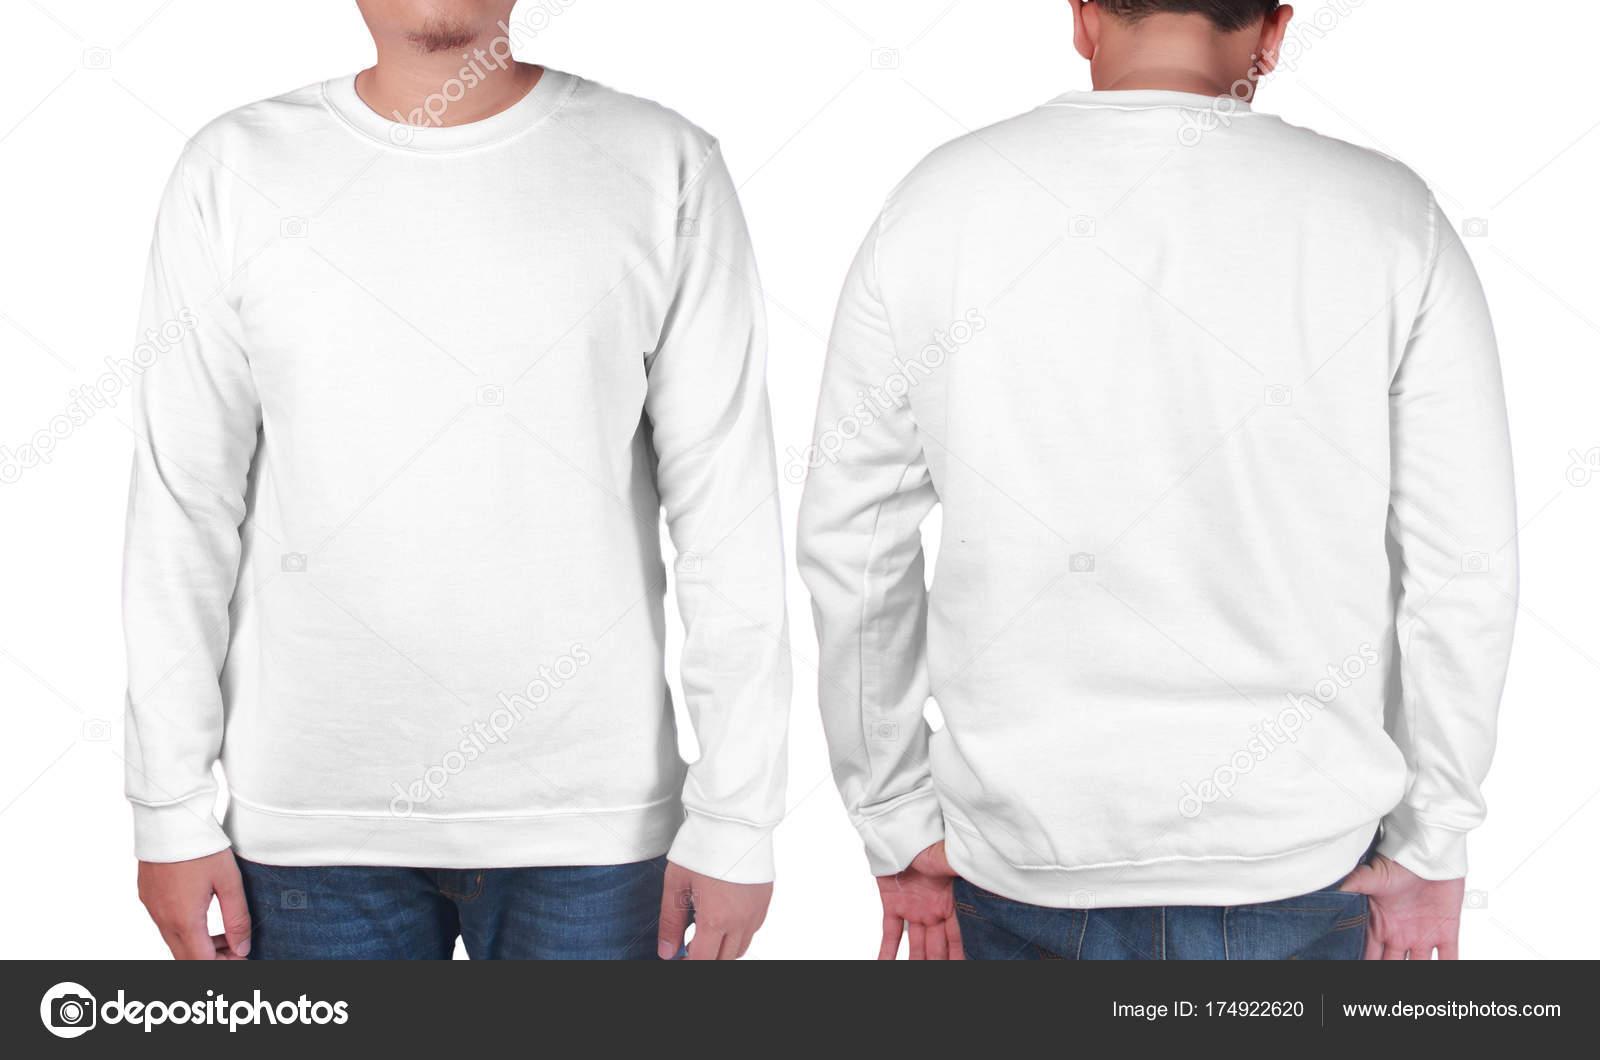 8360841113e4 Asian male model wear plain white long sleeved sweater shirt mockup. Sweat  clothes t-shirt jumper design presentation for print — Photo ...